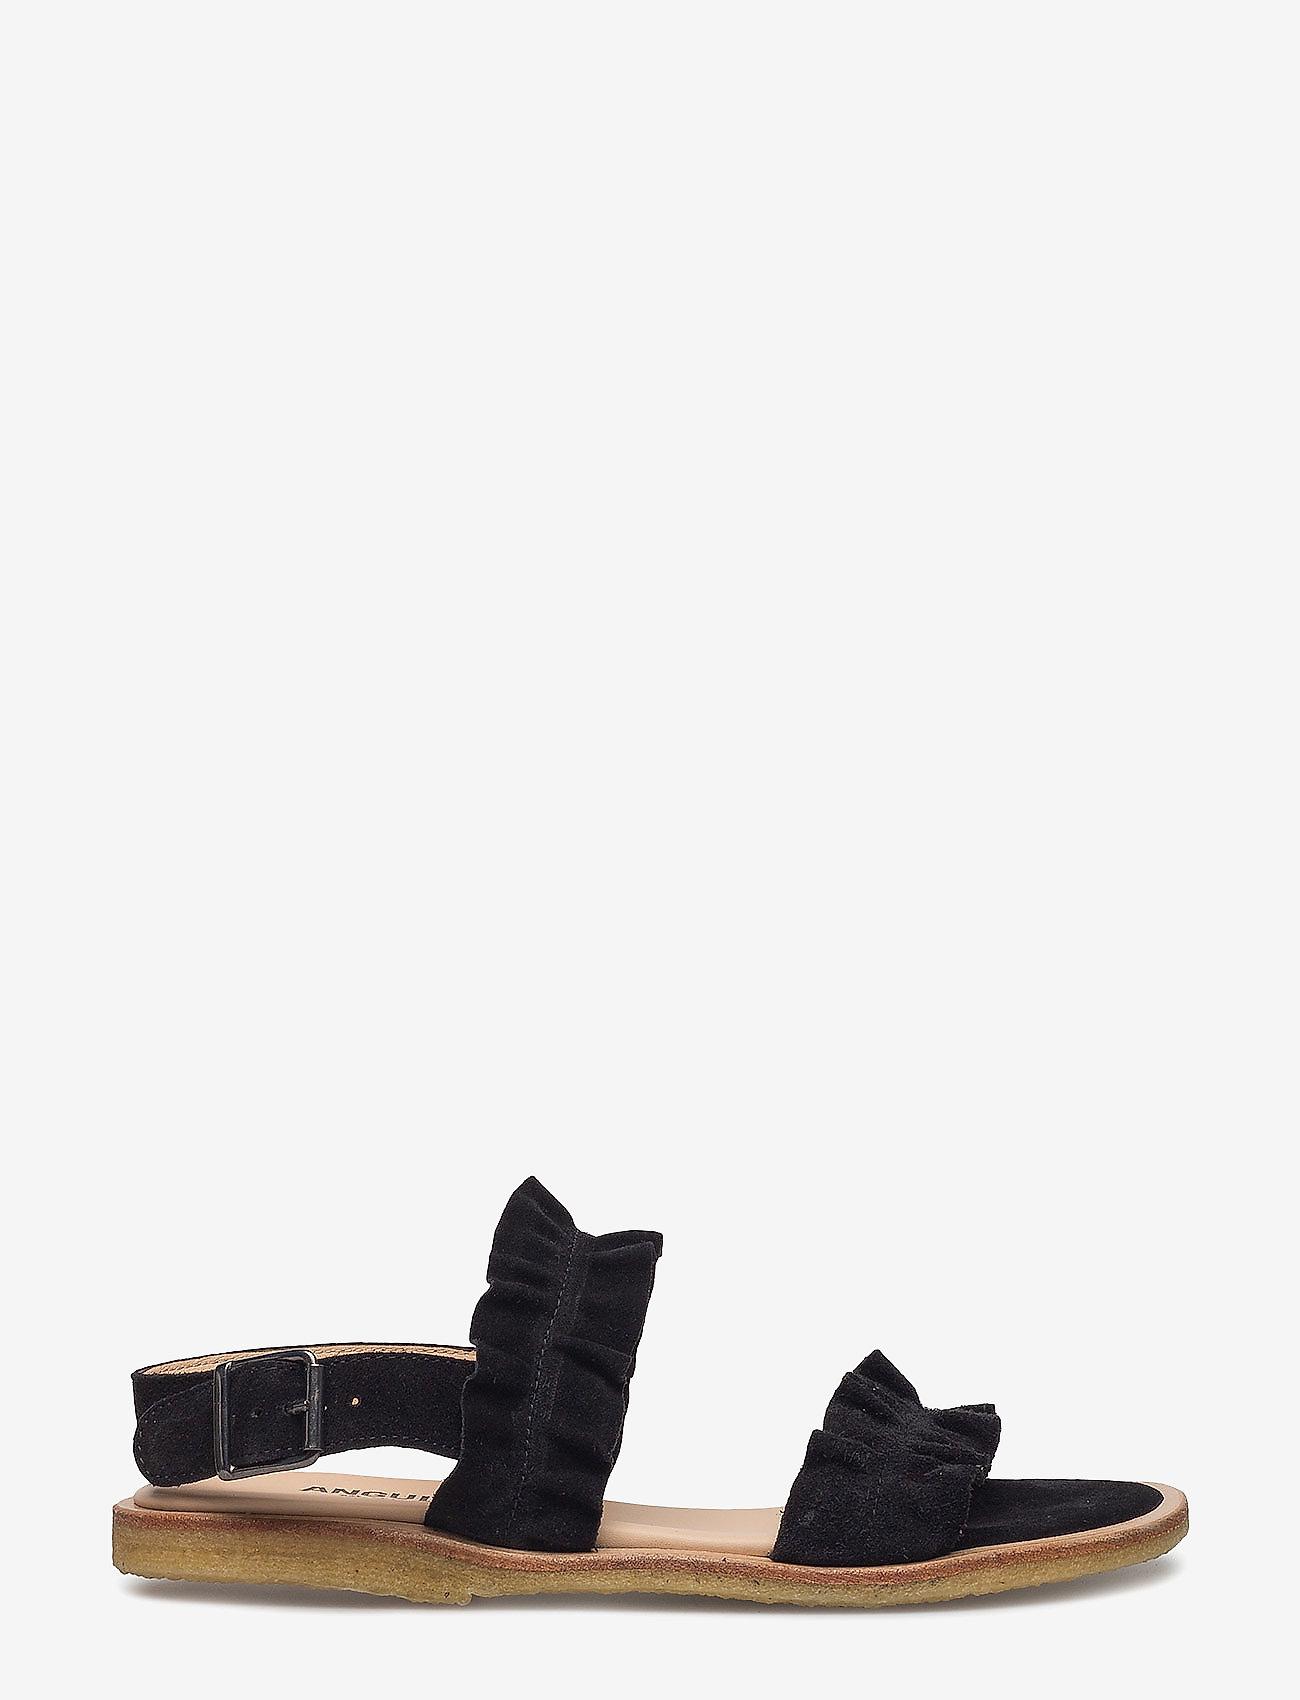 ANGULUS - Sandals - flat - open toe - op - platte sandalen - 1163 black - 1